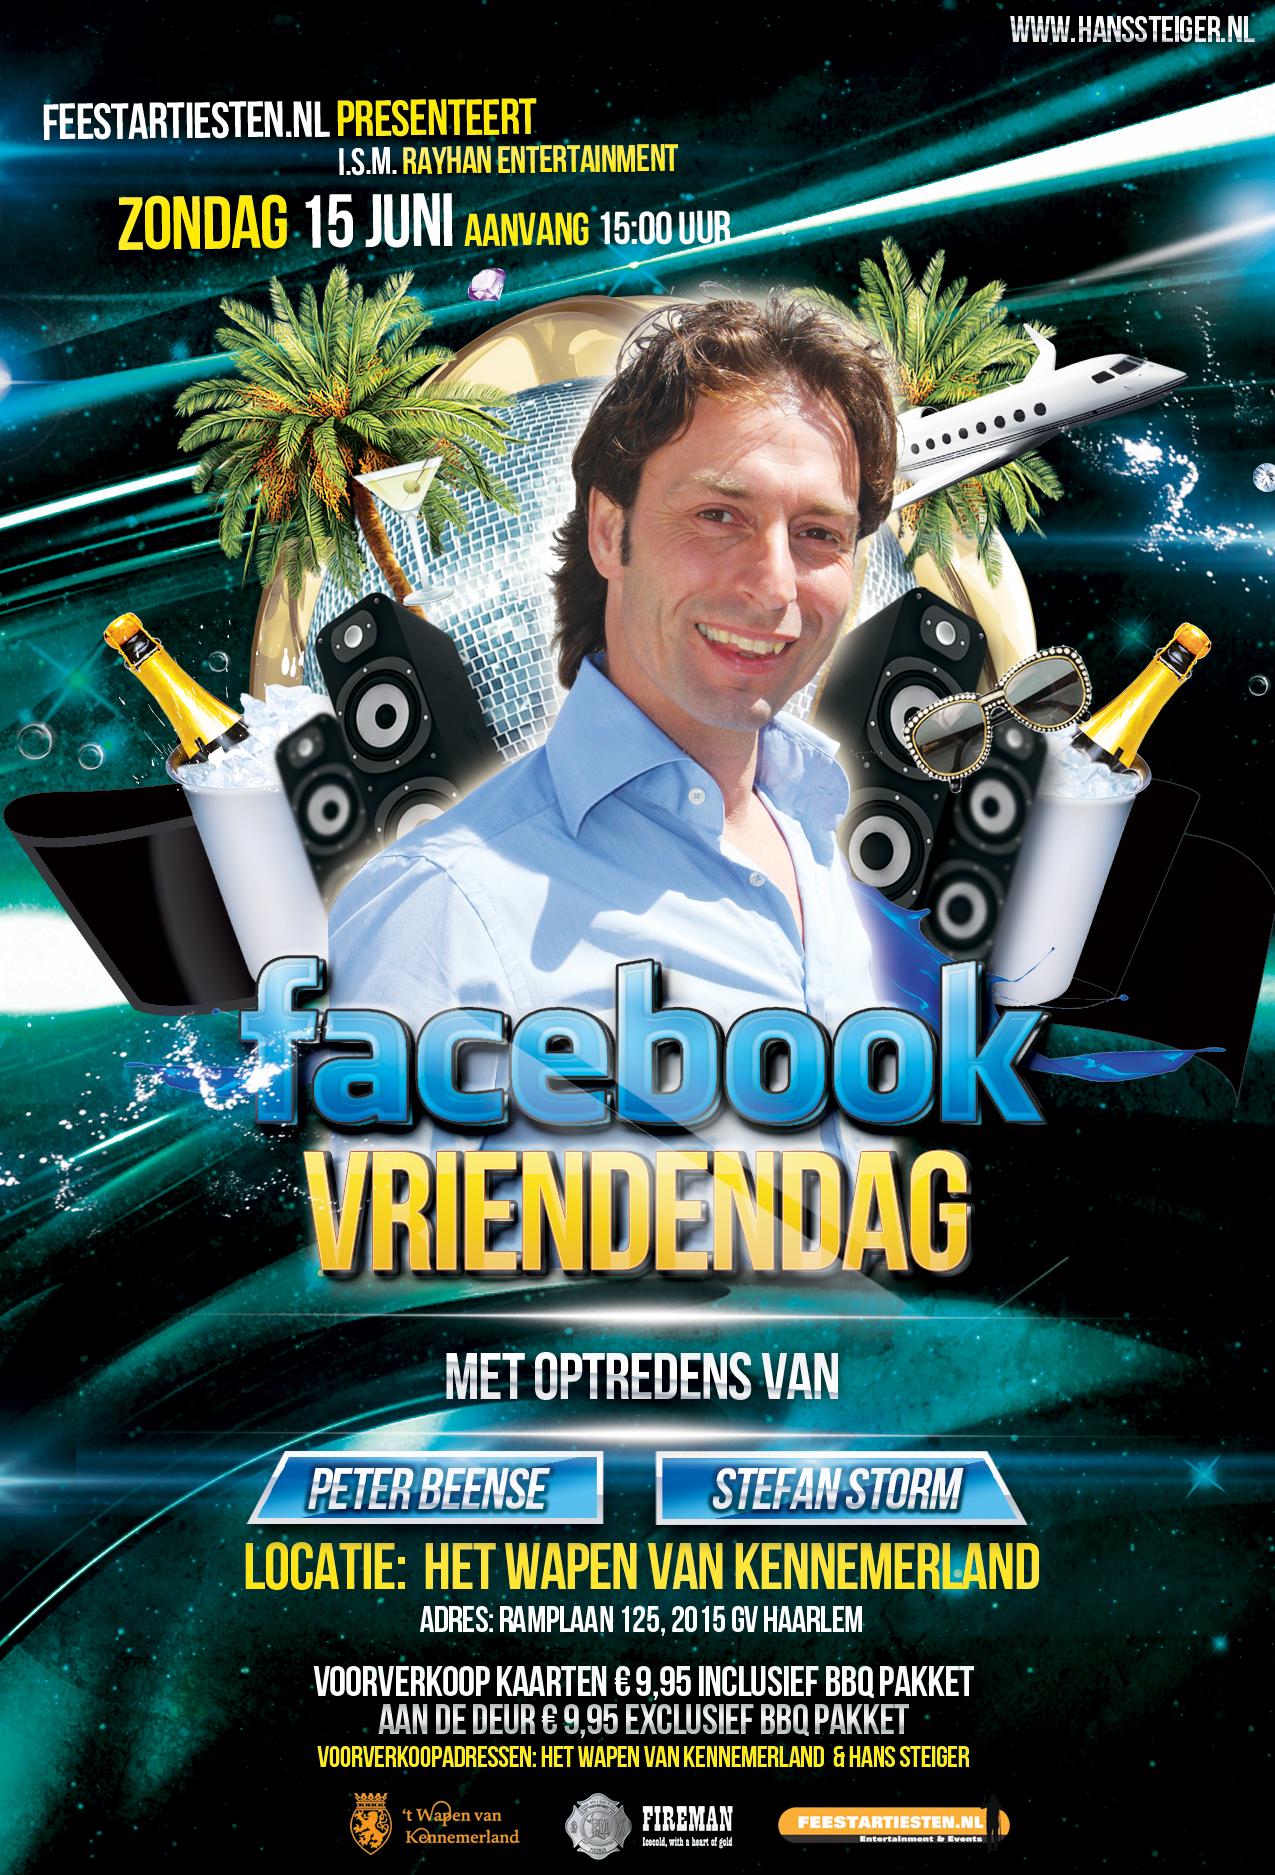 Facebook Vriendendag 2014